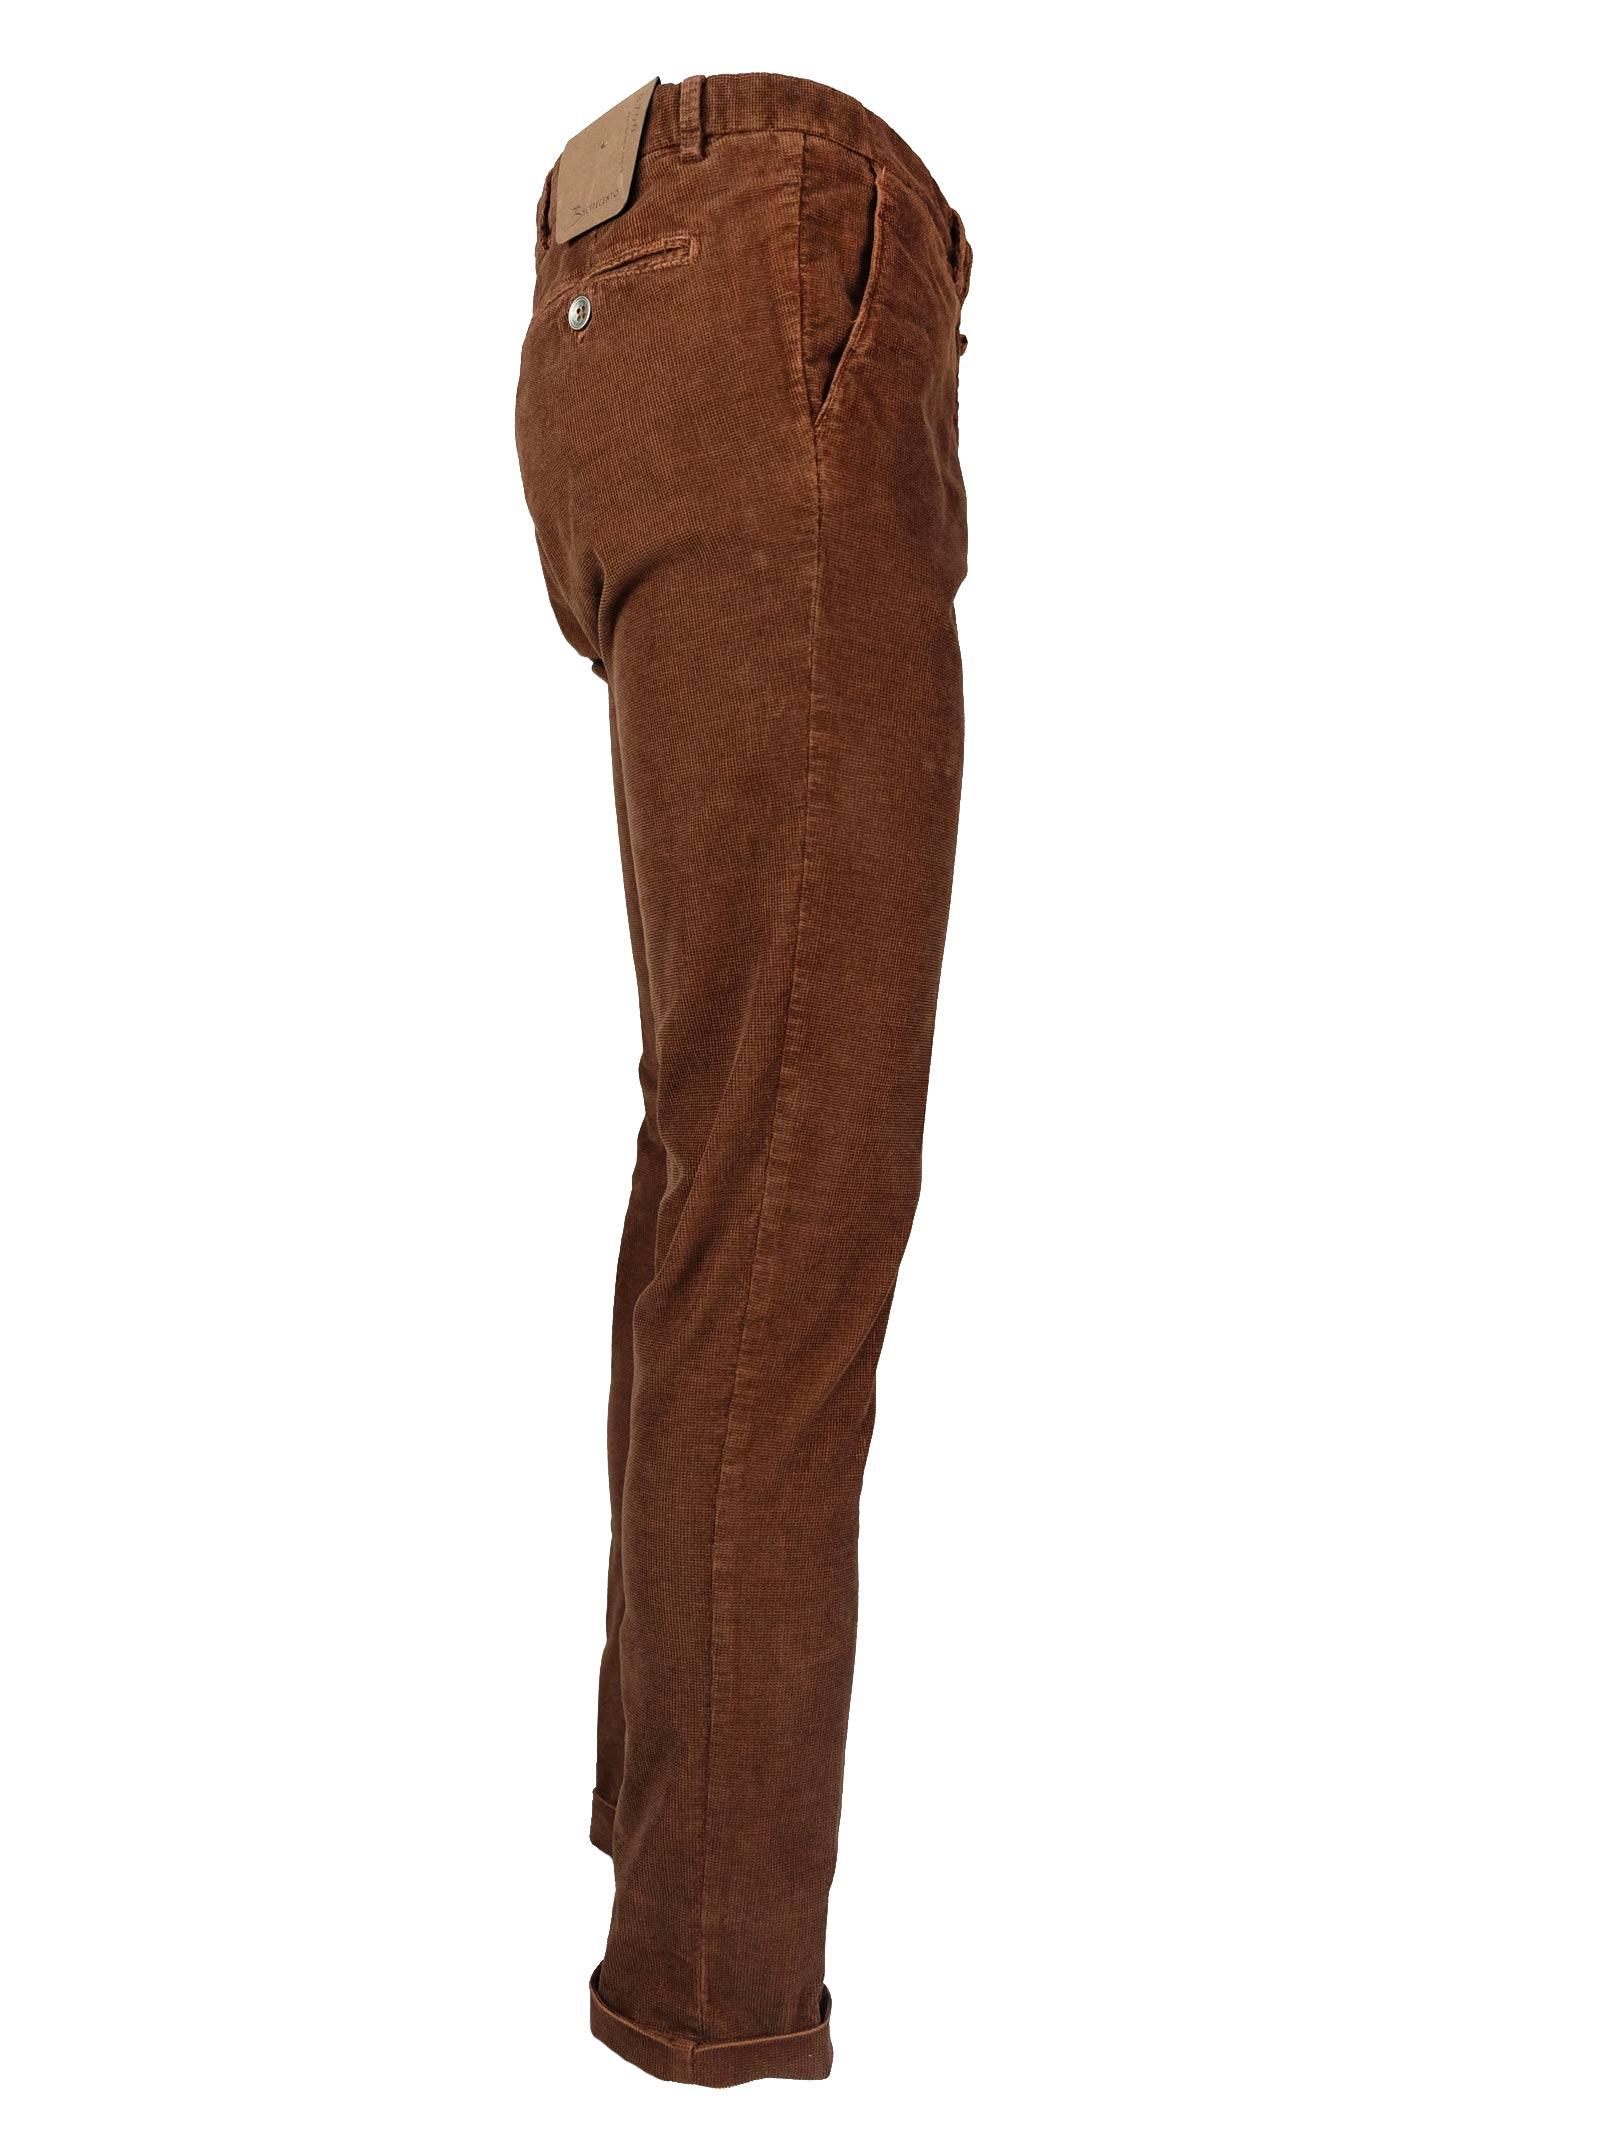 B700 | Trousers | MH700 802682